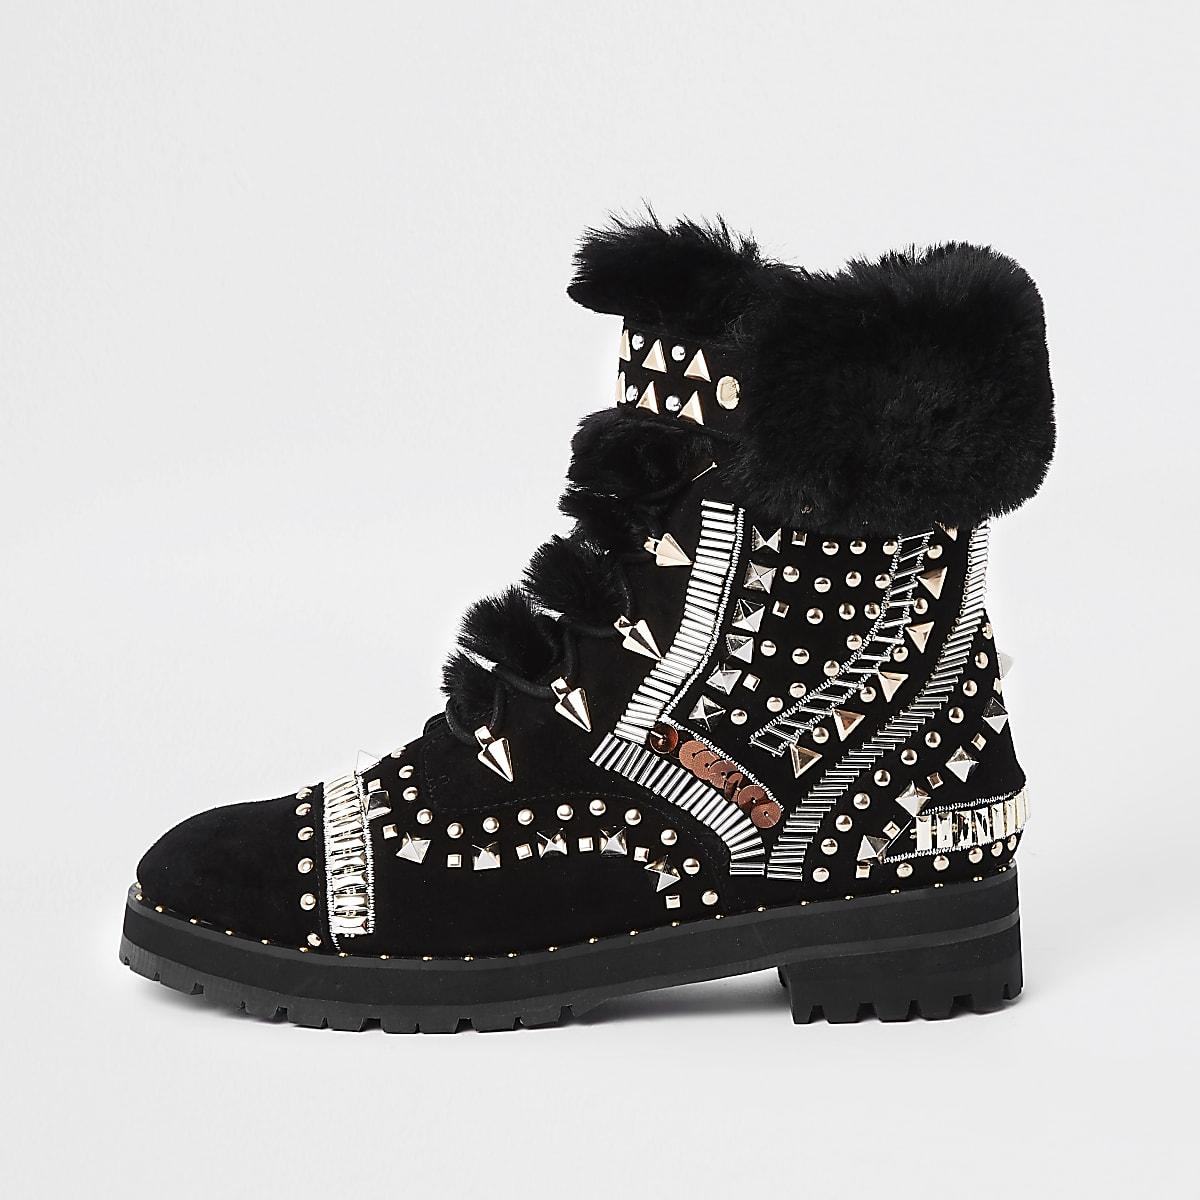 c5c2b8bfb346b RI 30 black faux fur trim embellished boots - Boots - Shoes   Boots - women